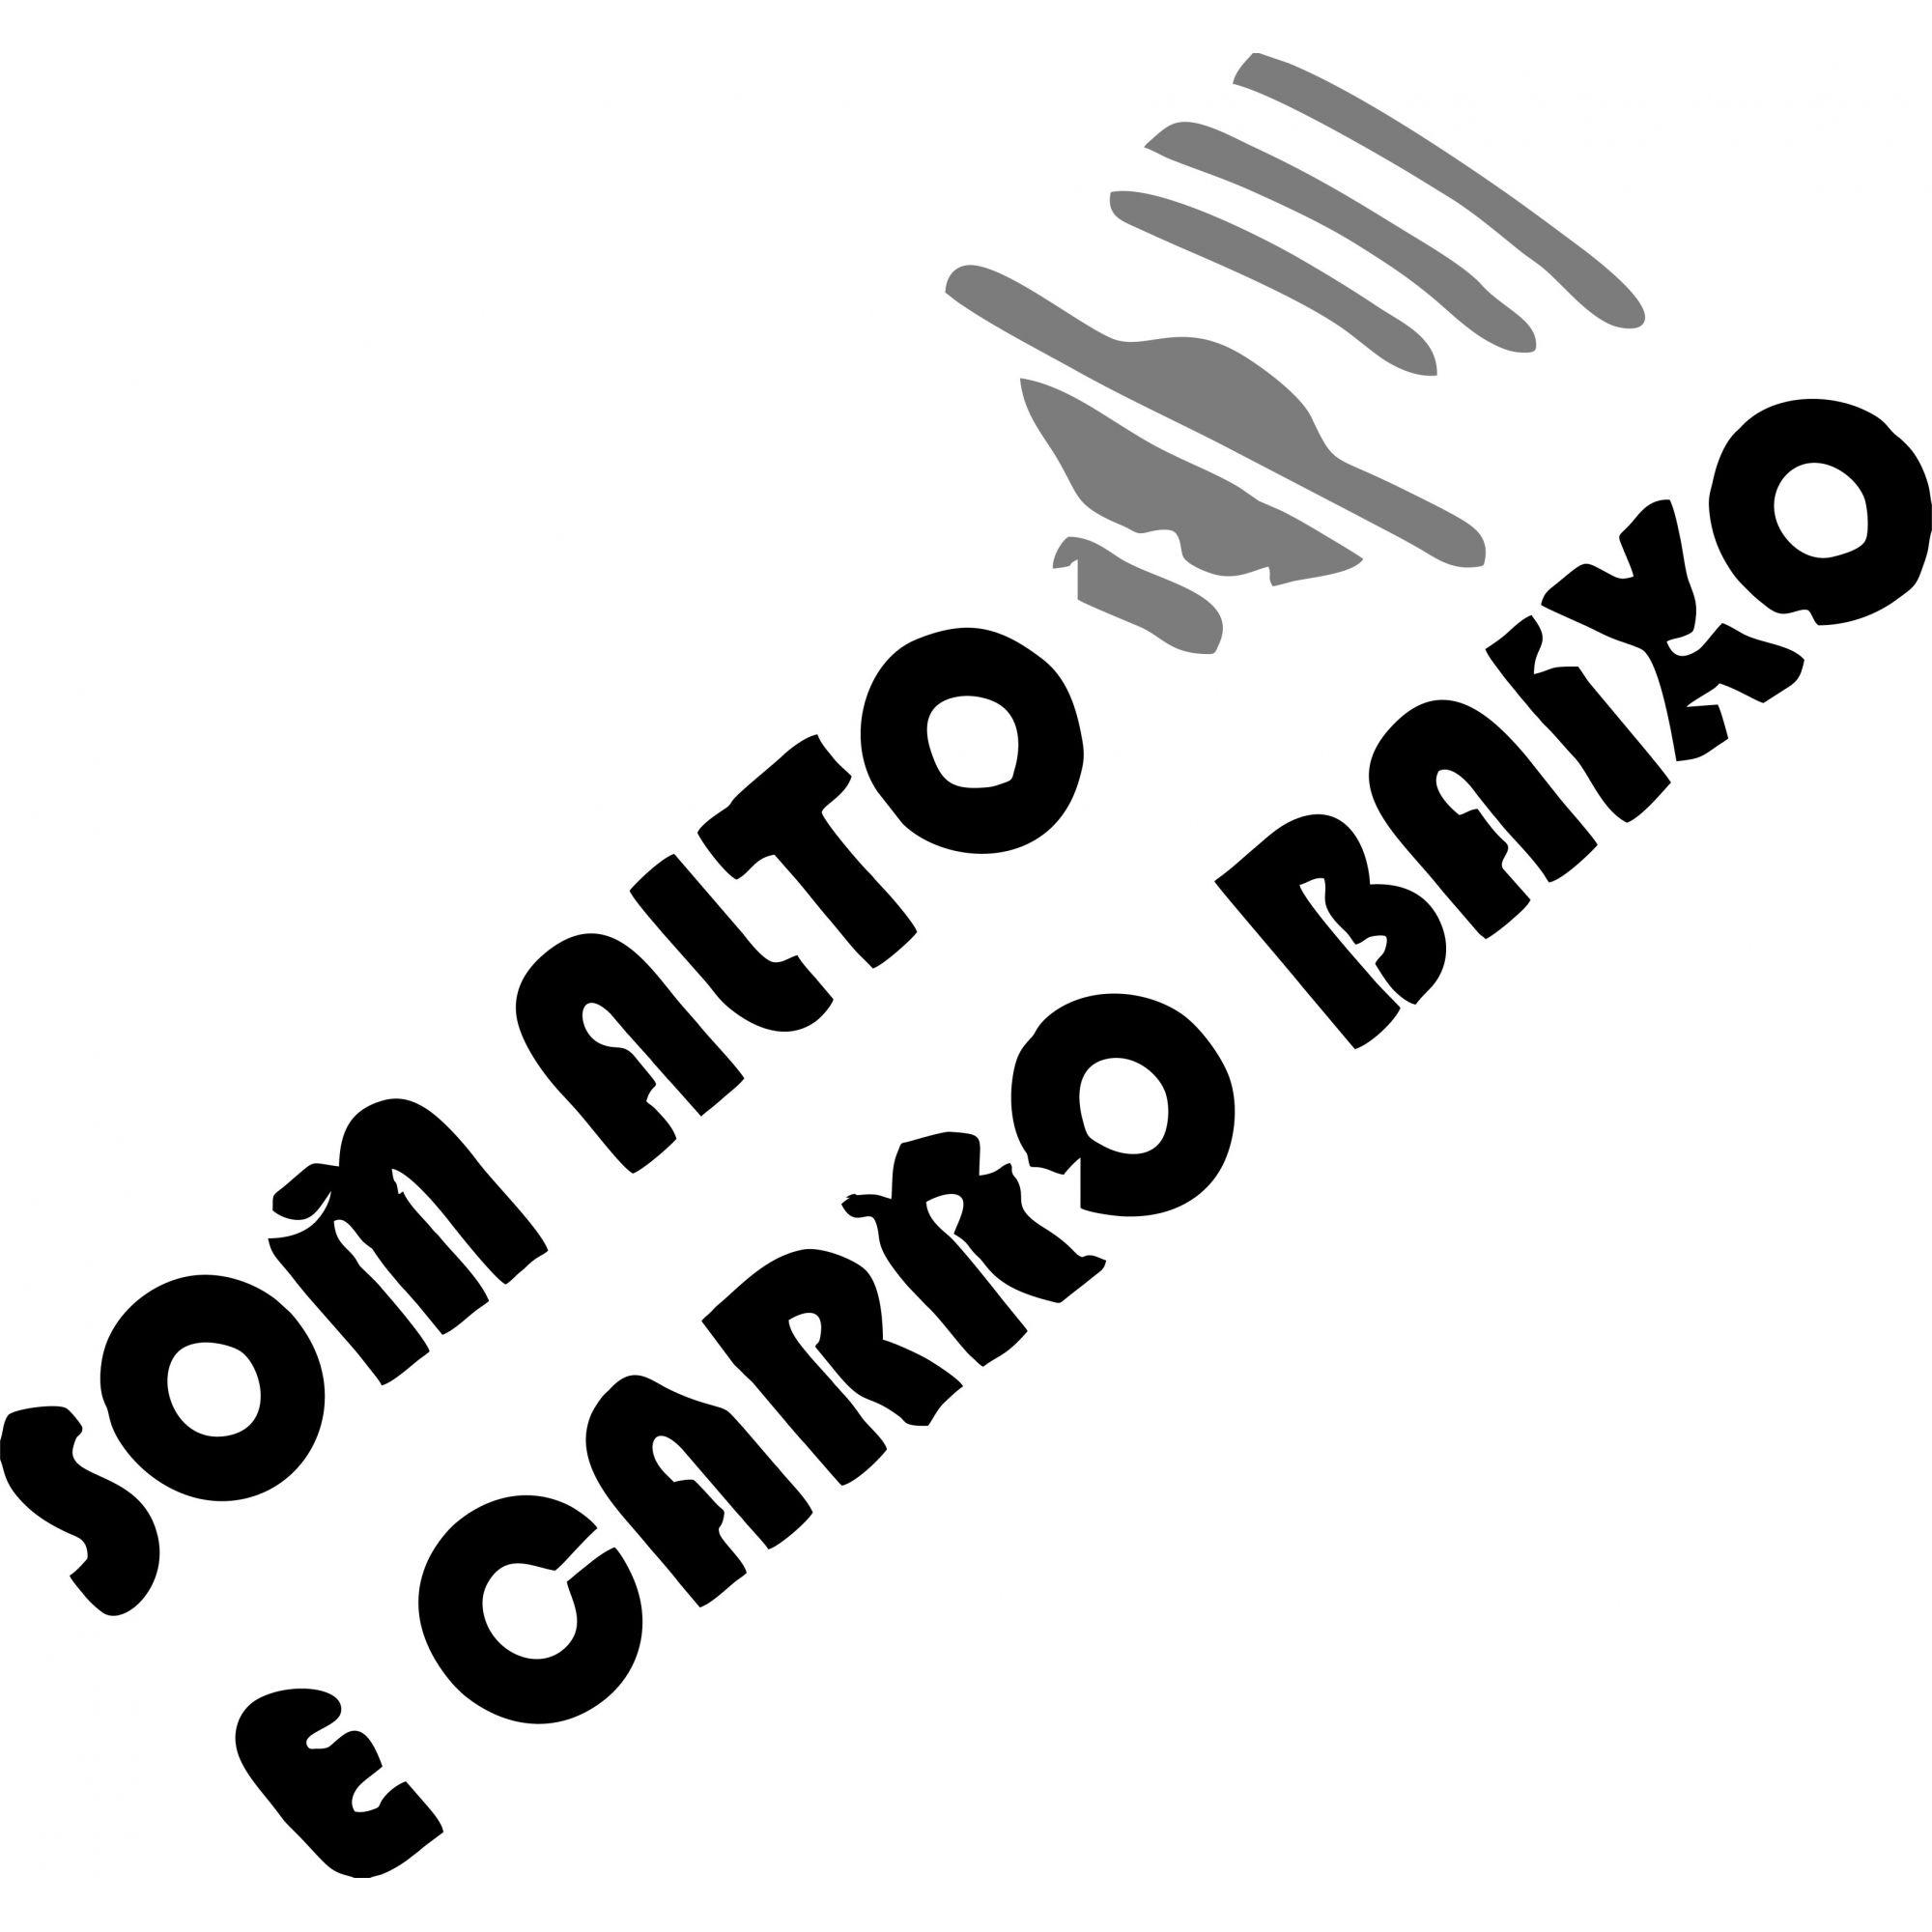 A1509 Auto Adesivo Automotivo Som Alto e Carro Baixo